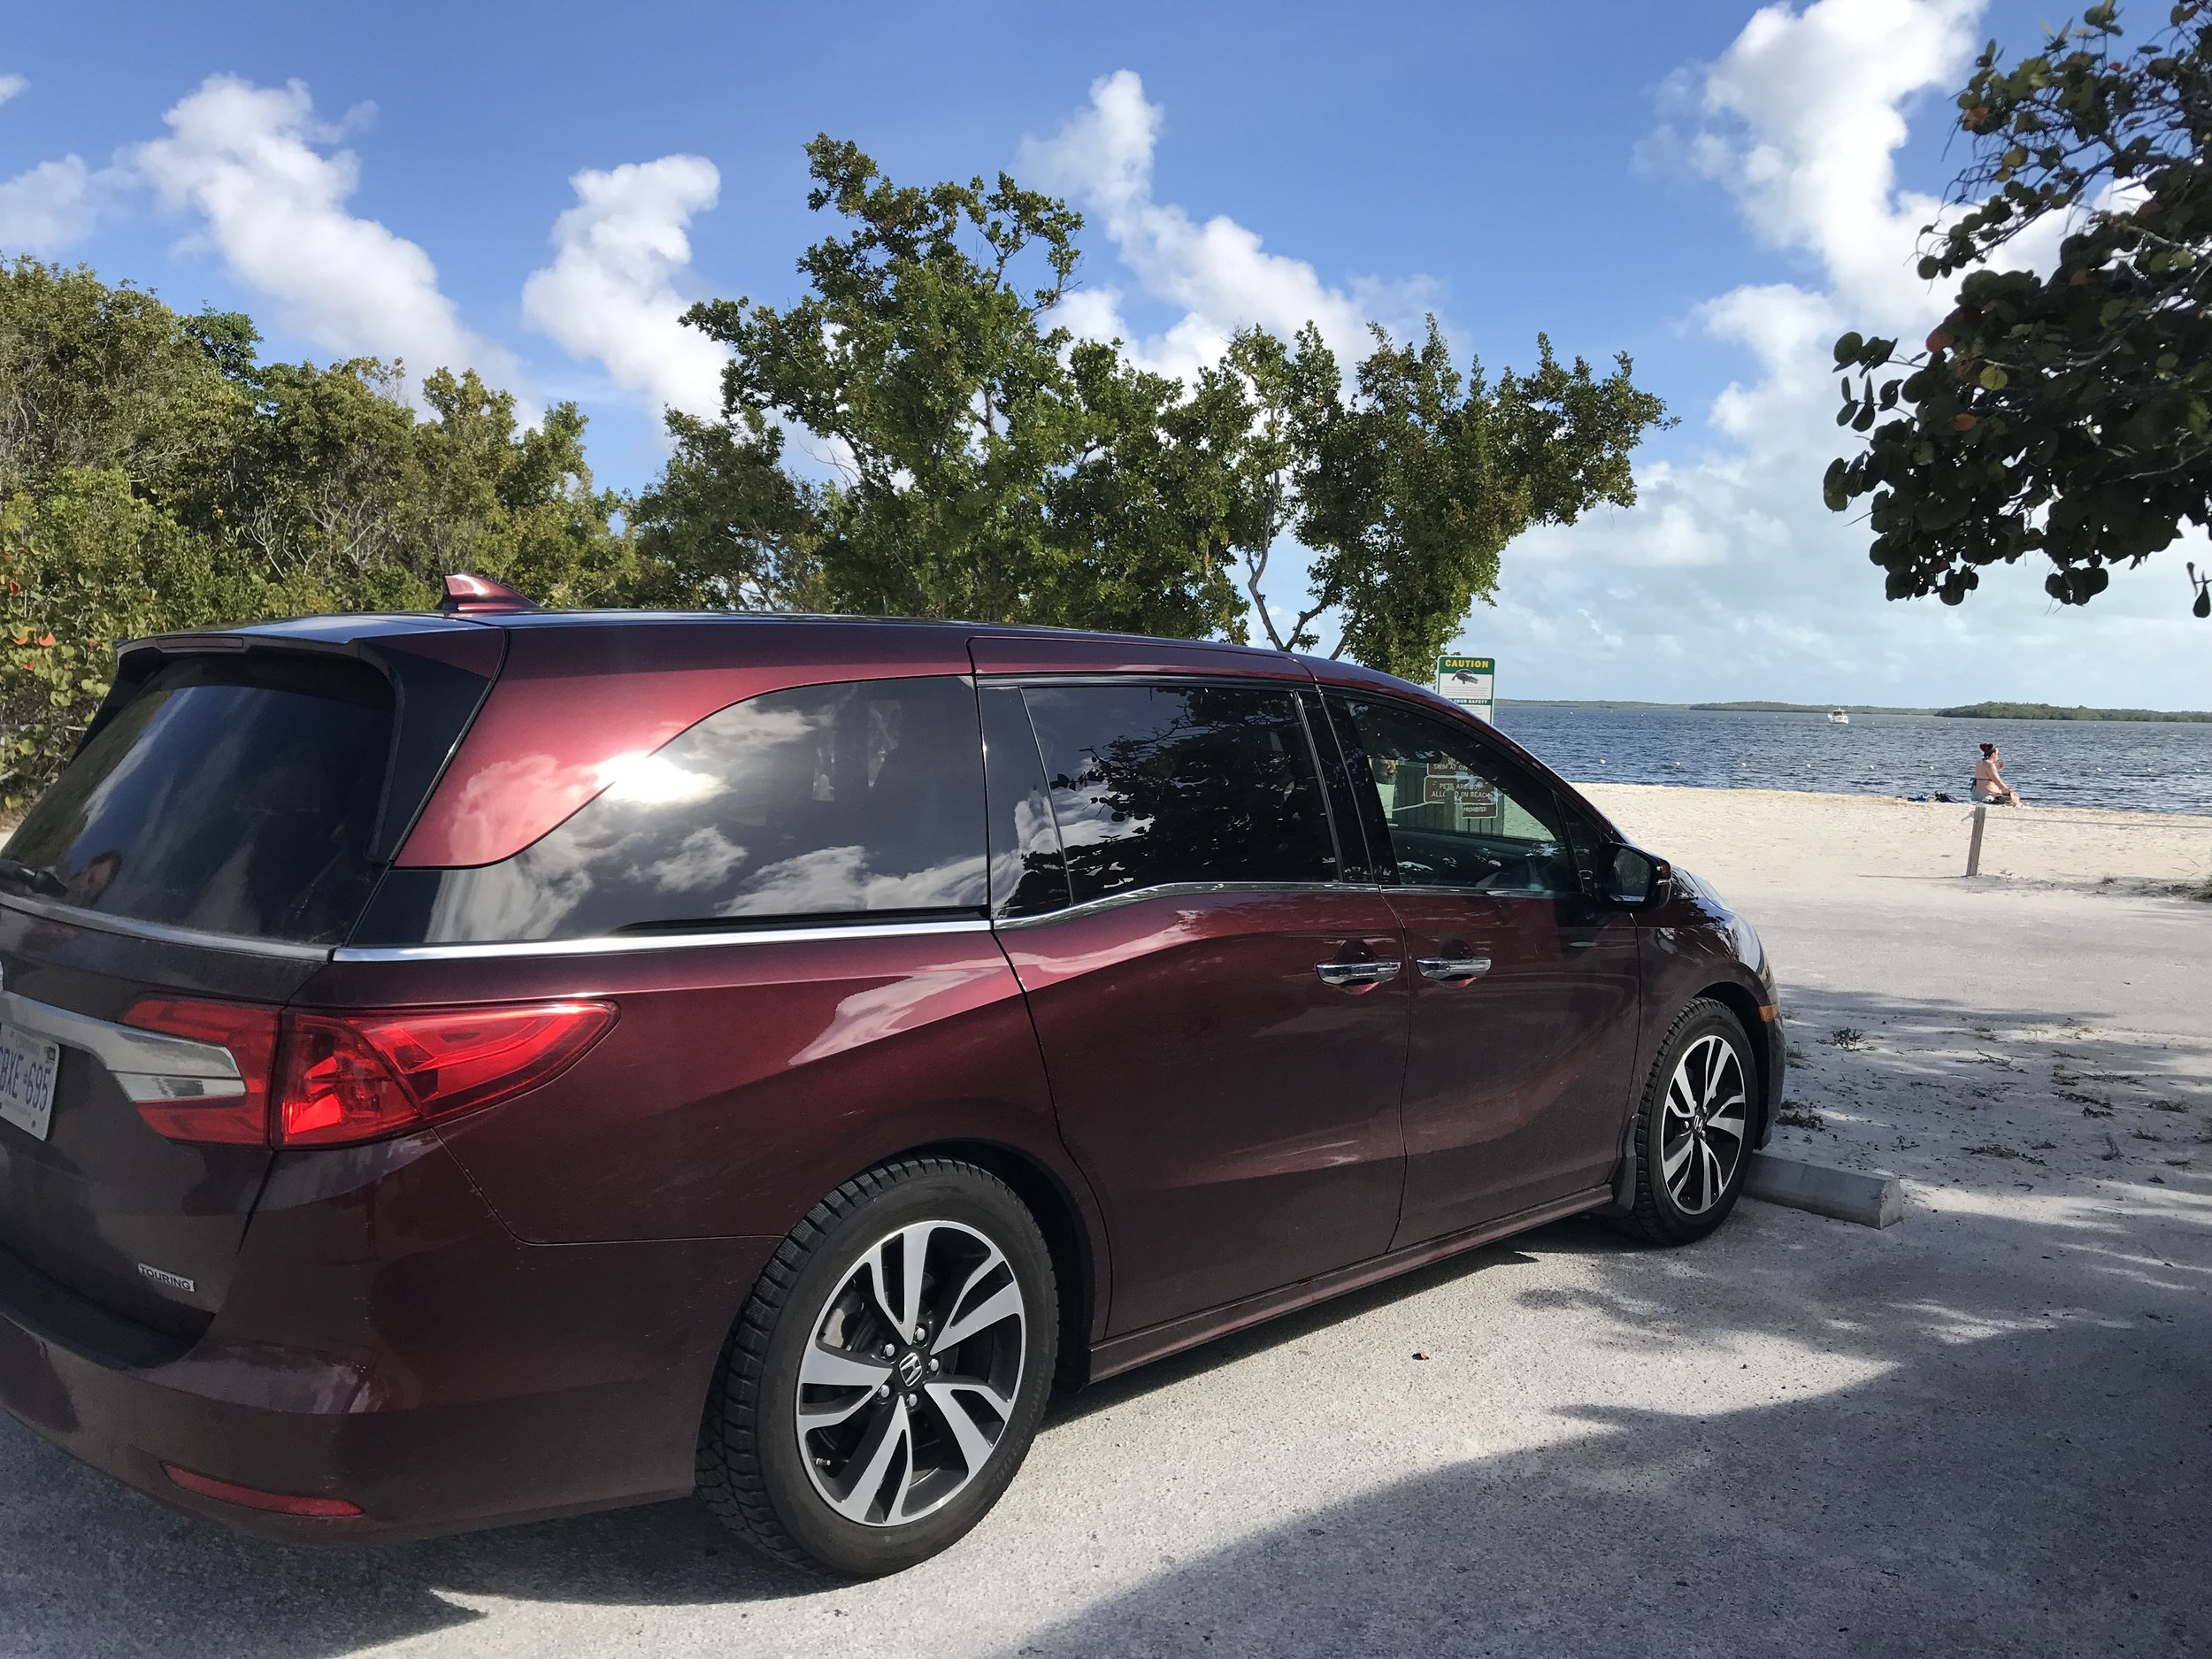 Honda Odyssey_Credit_JenniferMerrick (3).JPG